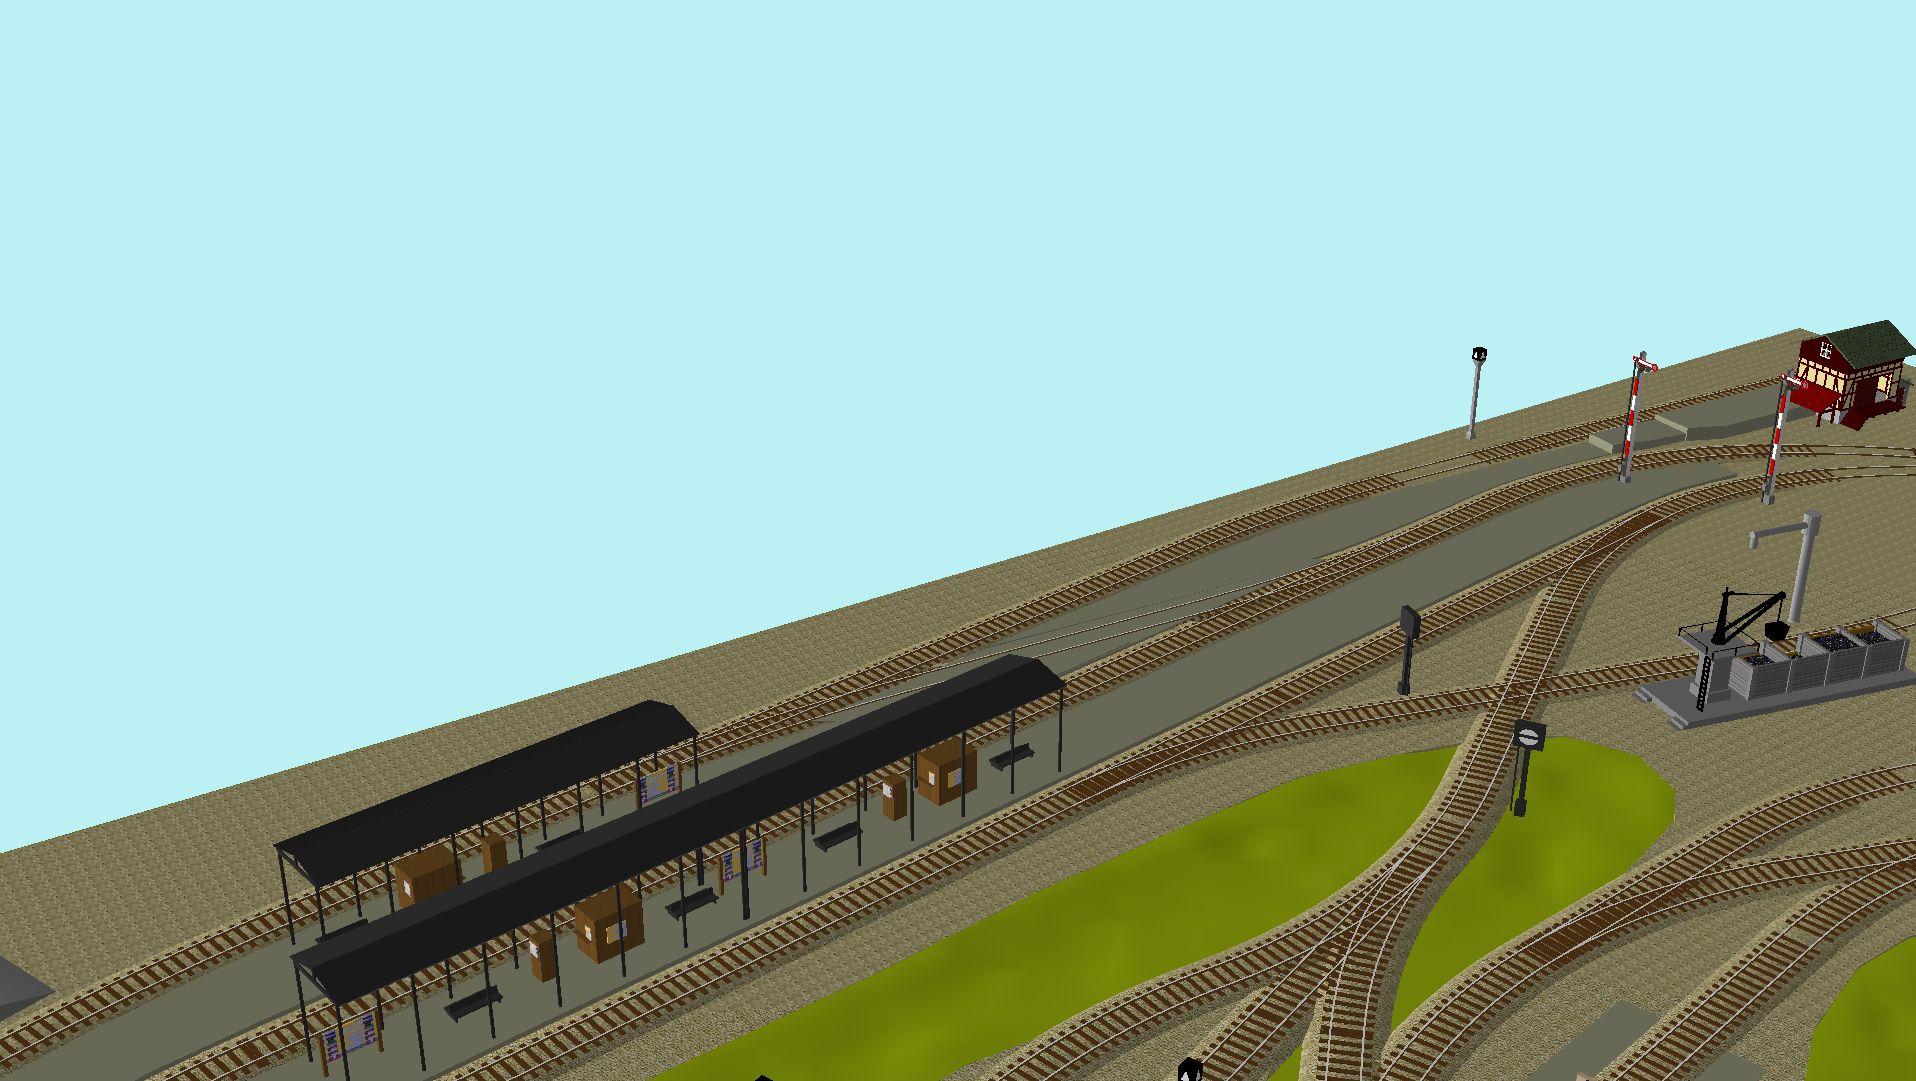 'ALBA Modellbahnpraxis' Band 1, Plan 5 Amp-1_5_c-gleis_freilwljc0